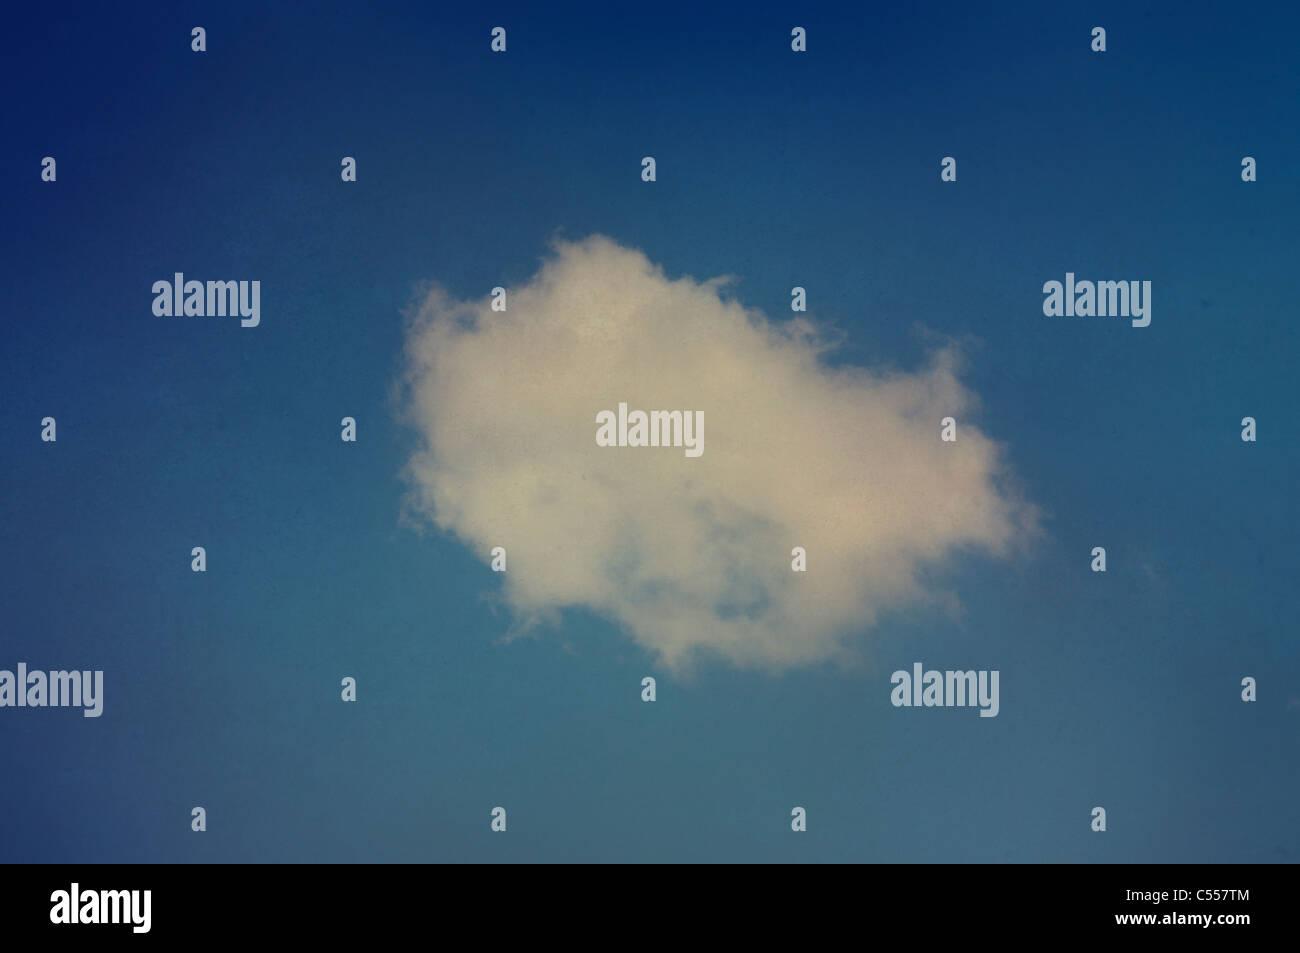 Single fluffy cloud - Stock Image